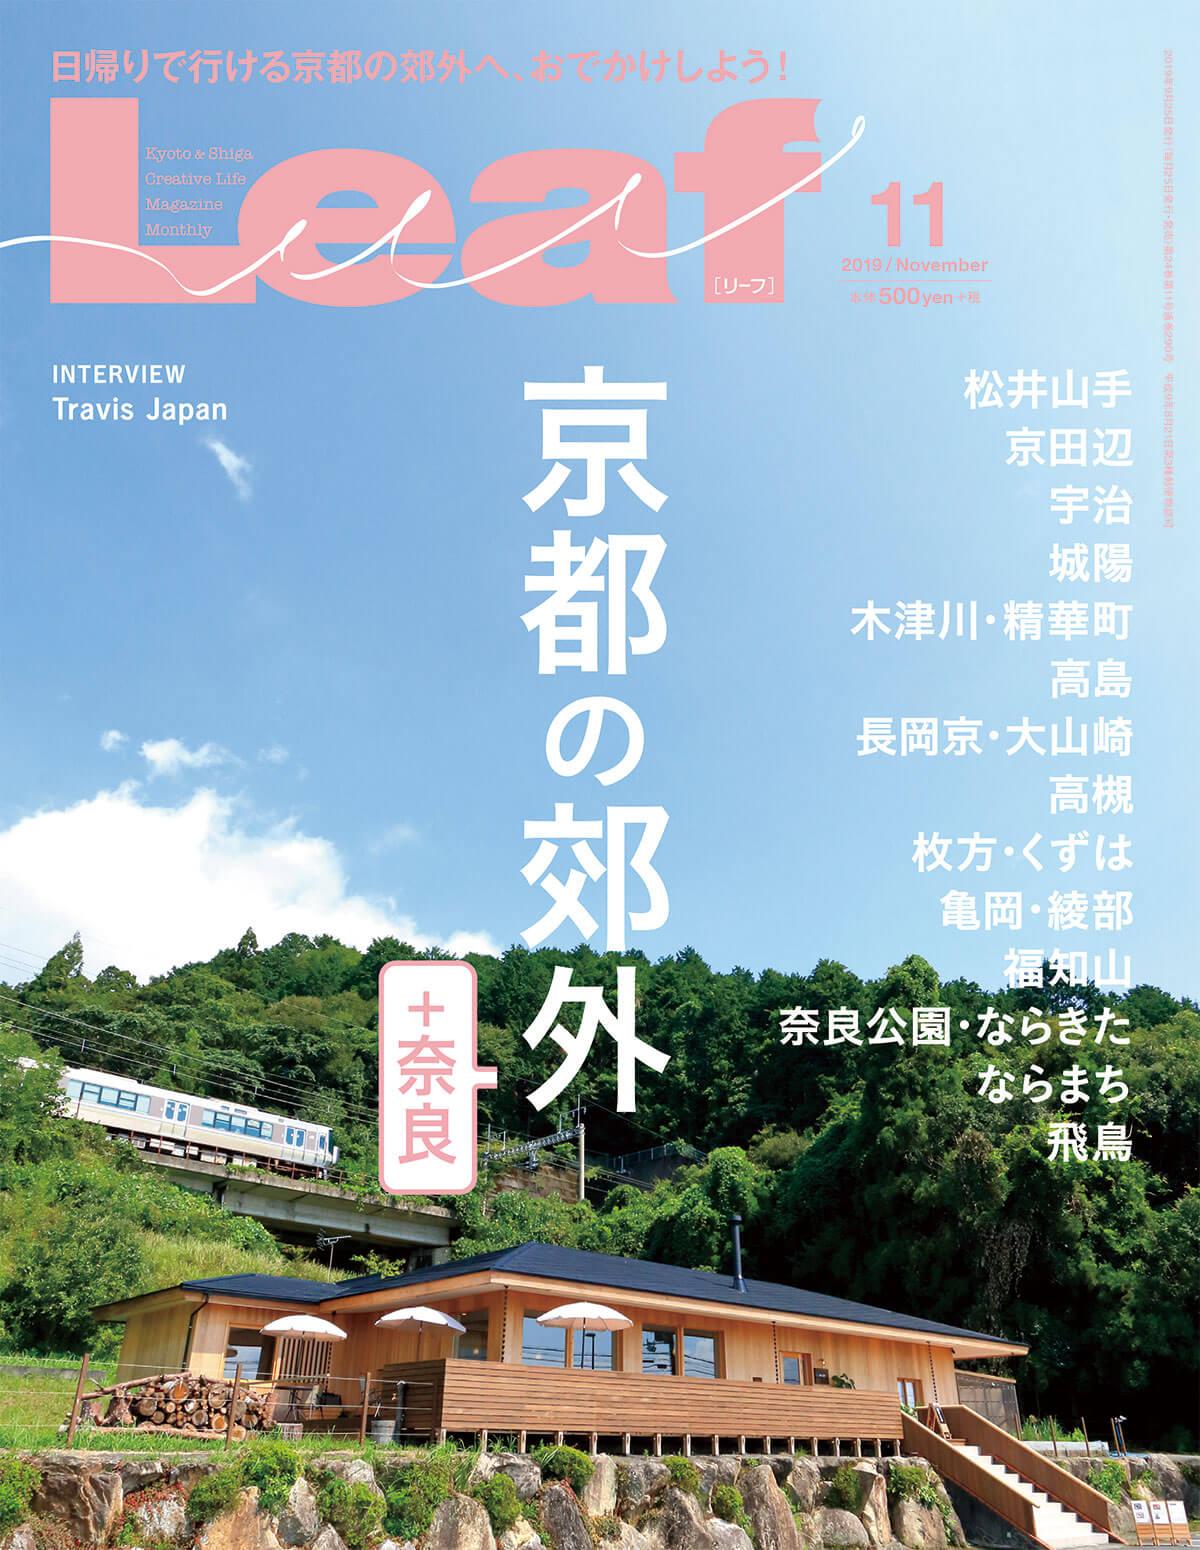 Leaf - 京都の郊外へ+奈良